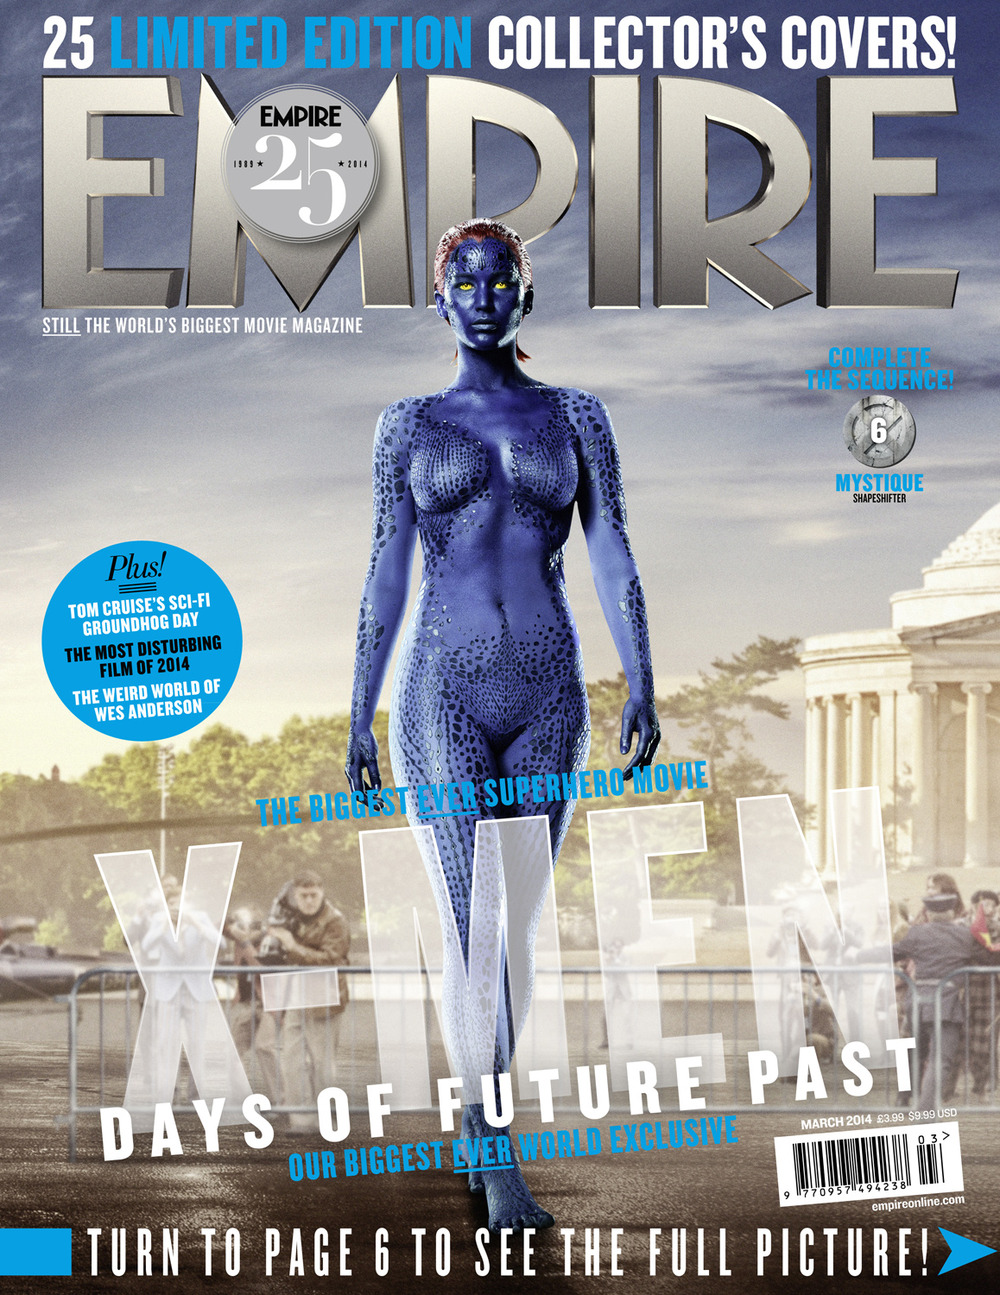 Jennifer Lawrence Nude as X-Men's Mystique on Empire Magazine Cover (PHOTO)